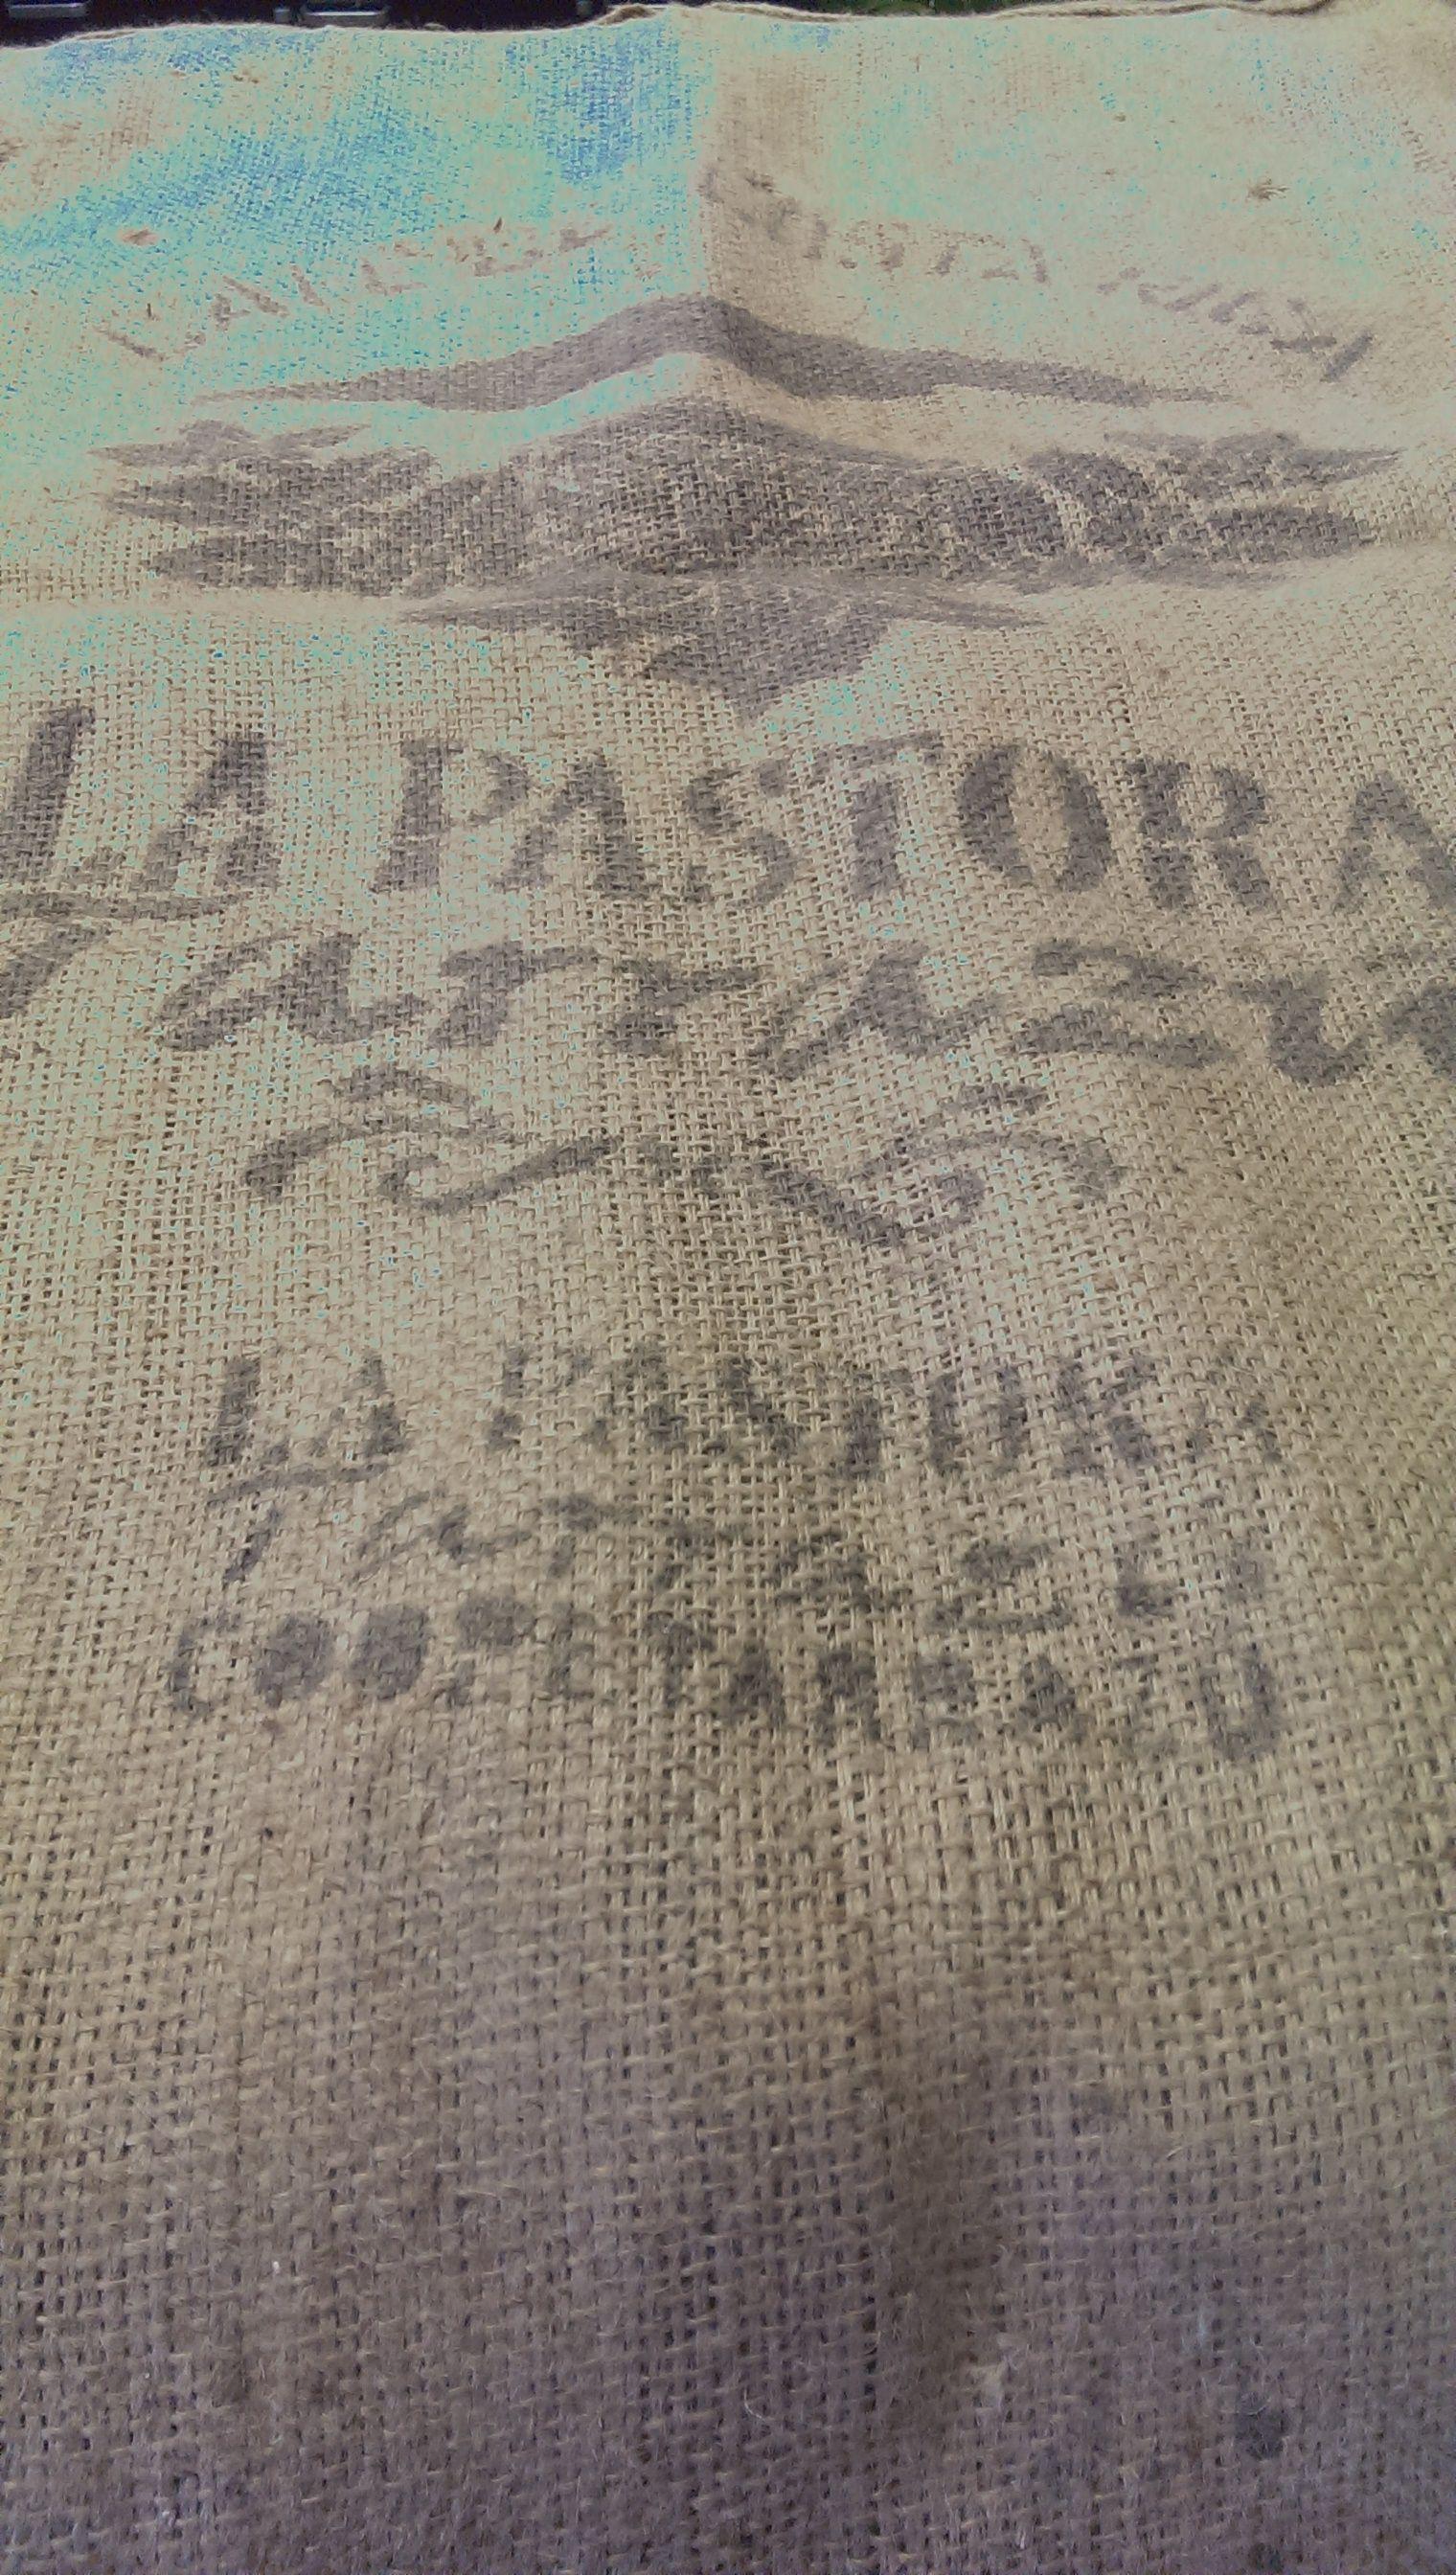 La Pastora coffee, grown in the high Tarrazu region of Costa Rica.